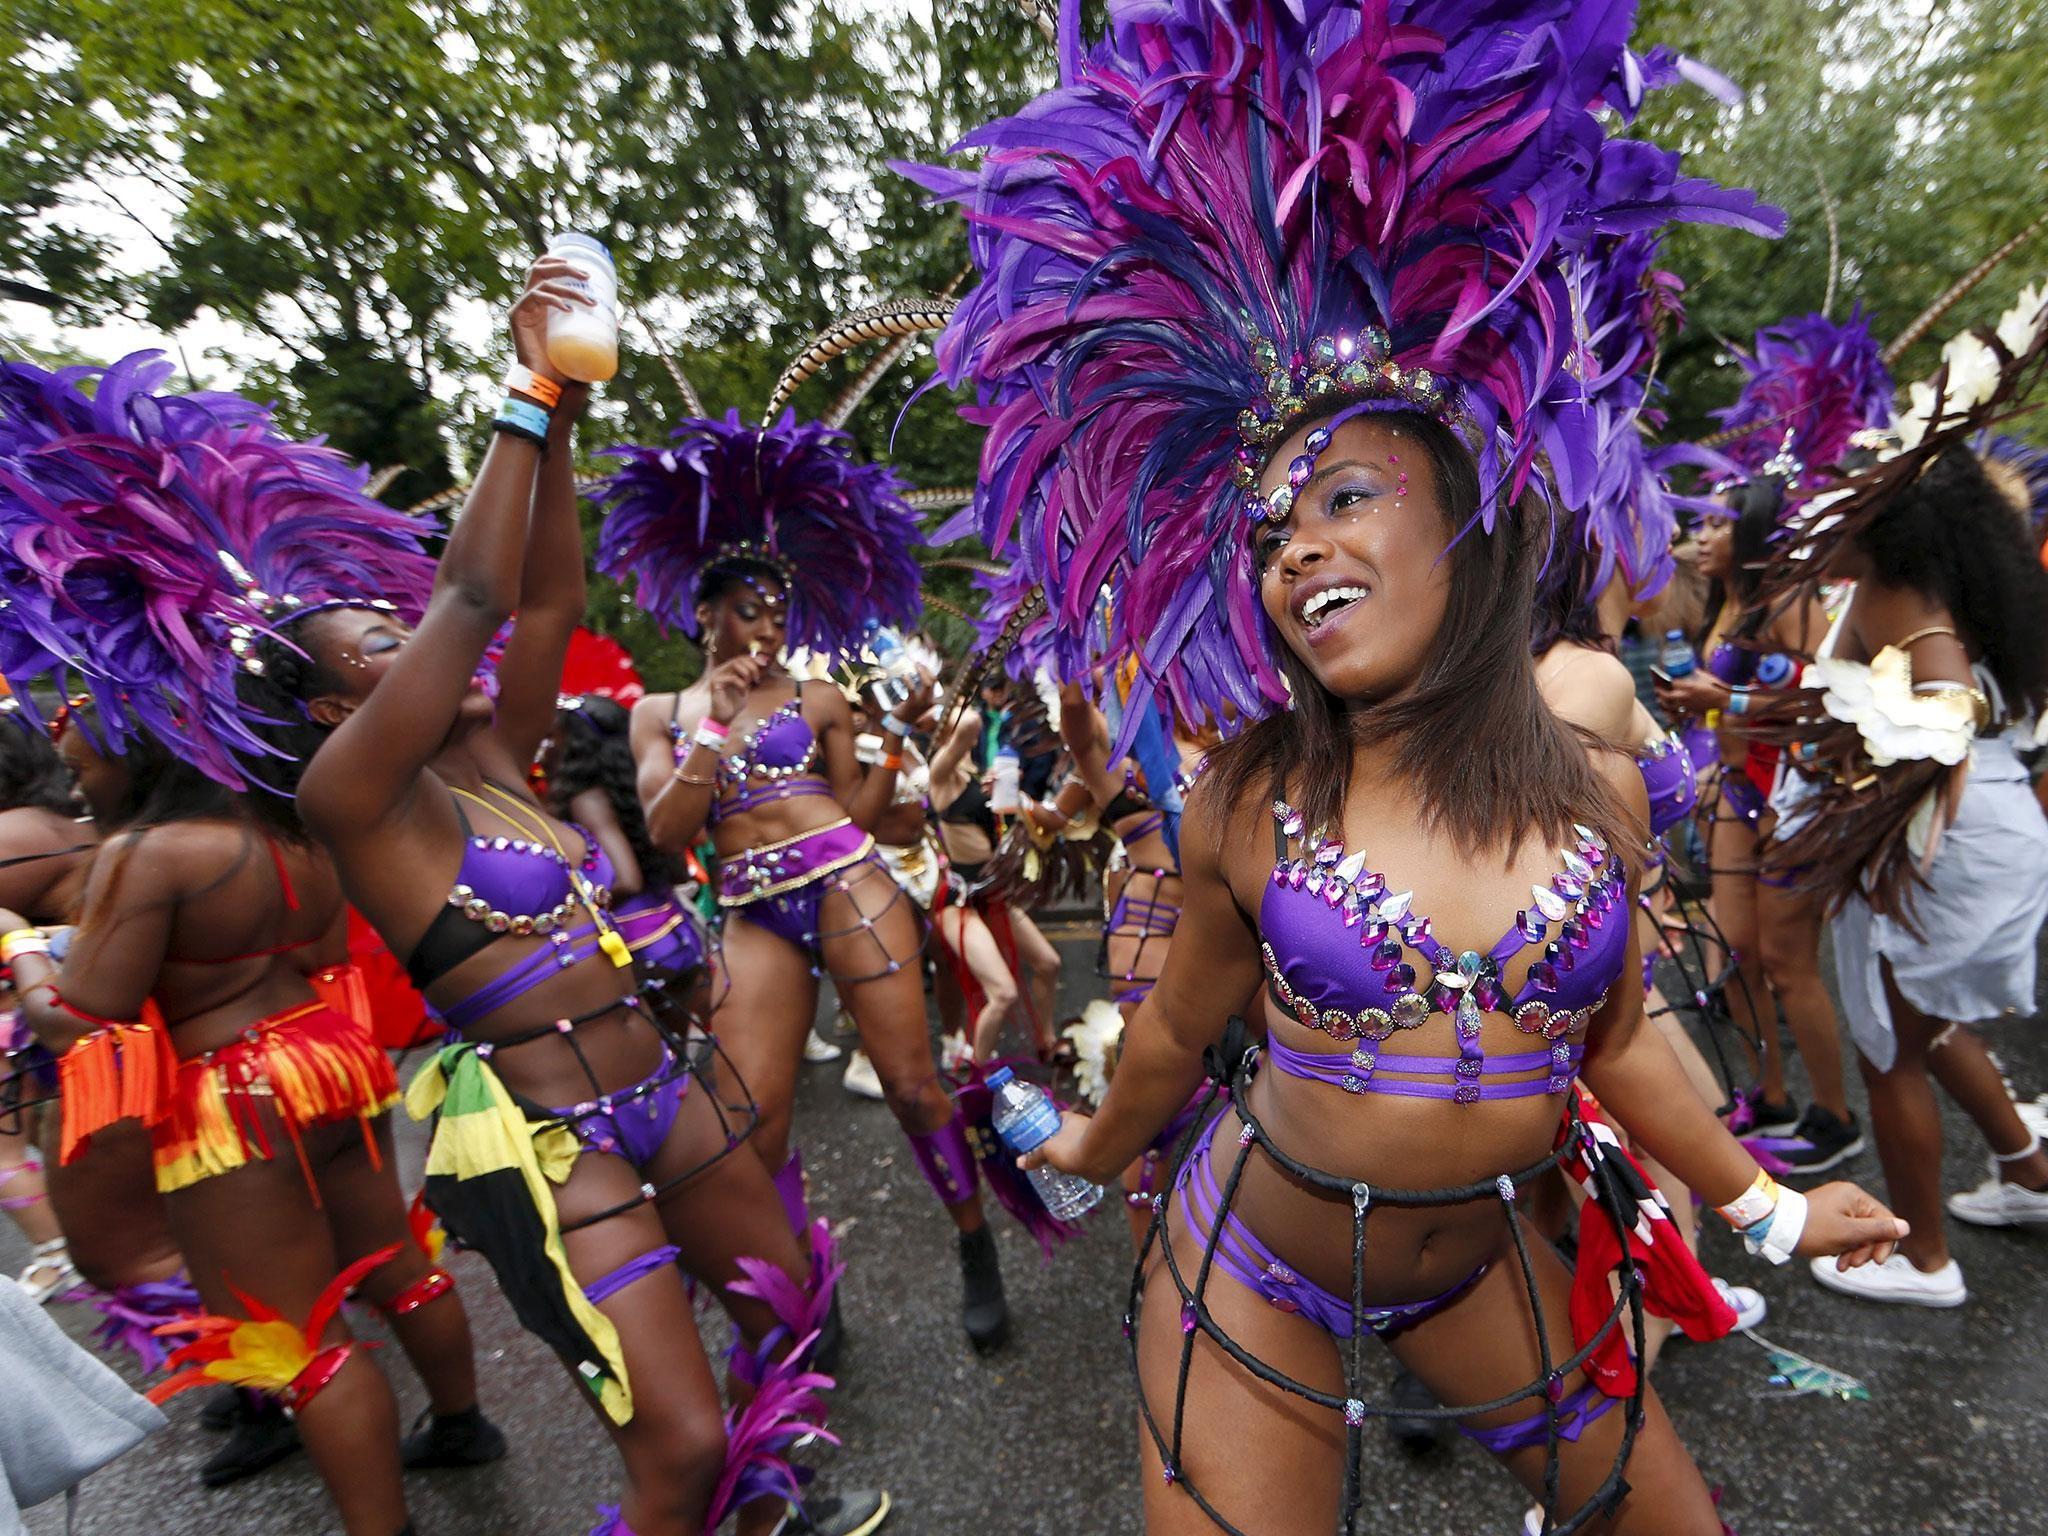 carnaval de Notting Hill 2016 Londres | Carnavals | Pinterest ...